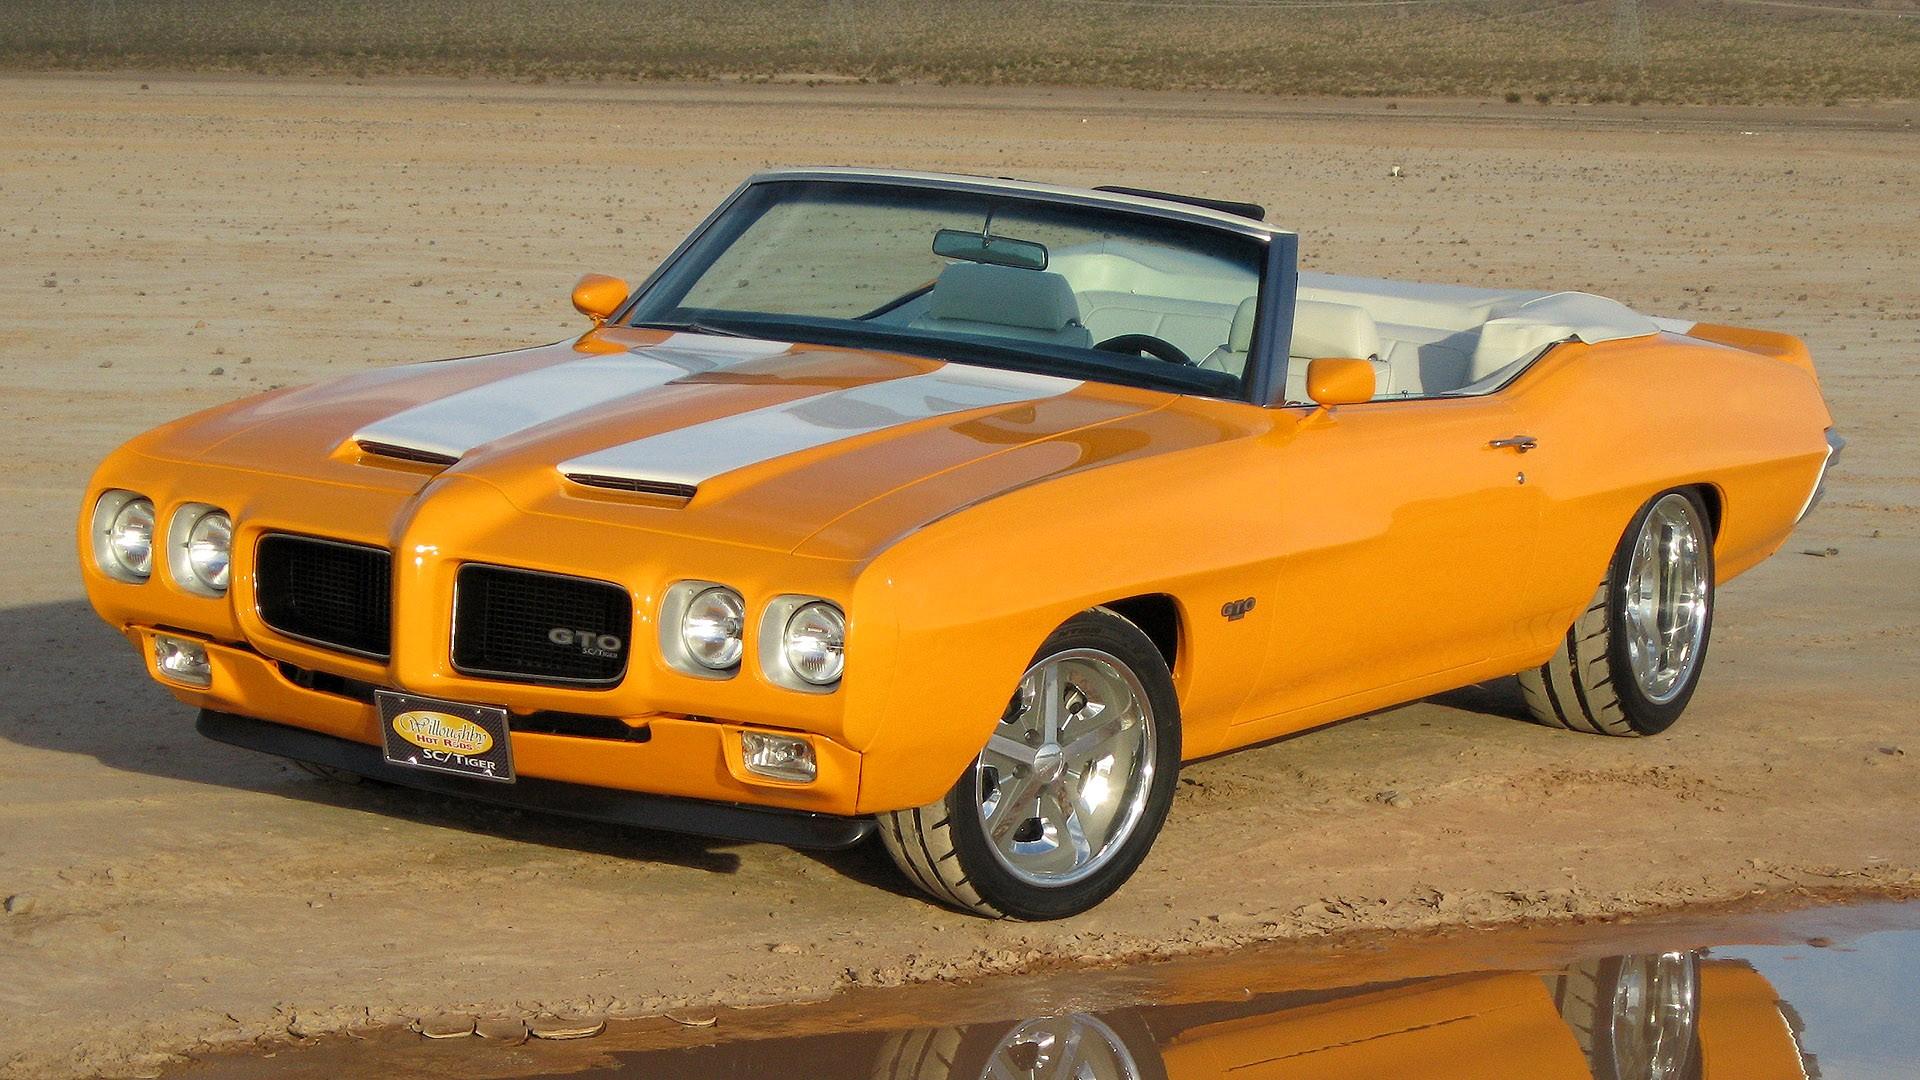 1970 Pontiac GTO Sport Coupe Cars Hot Rod 1970 Classic Cars Widescreen 1920x1080